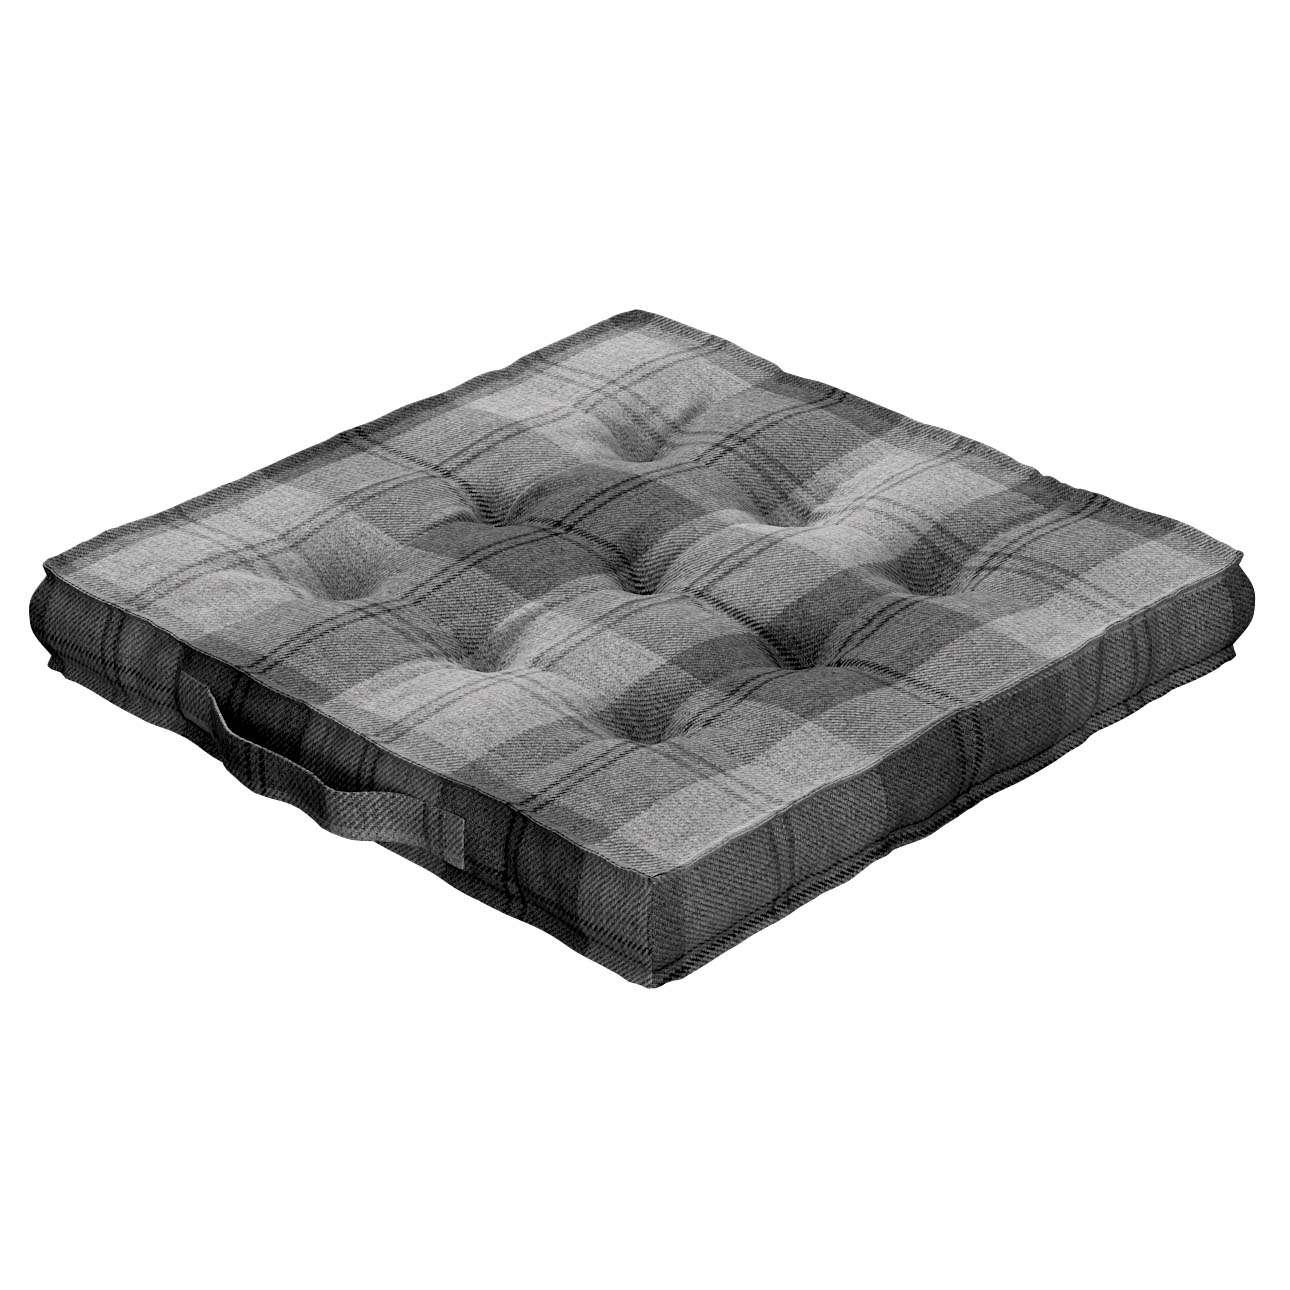 Stolehynde Jacob fra kollektionen Edinburgh, Stof: 115-75